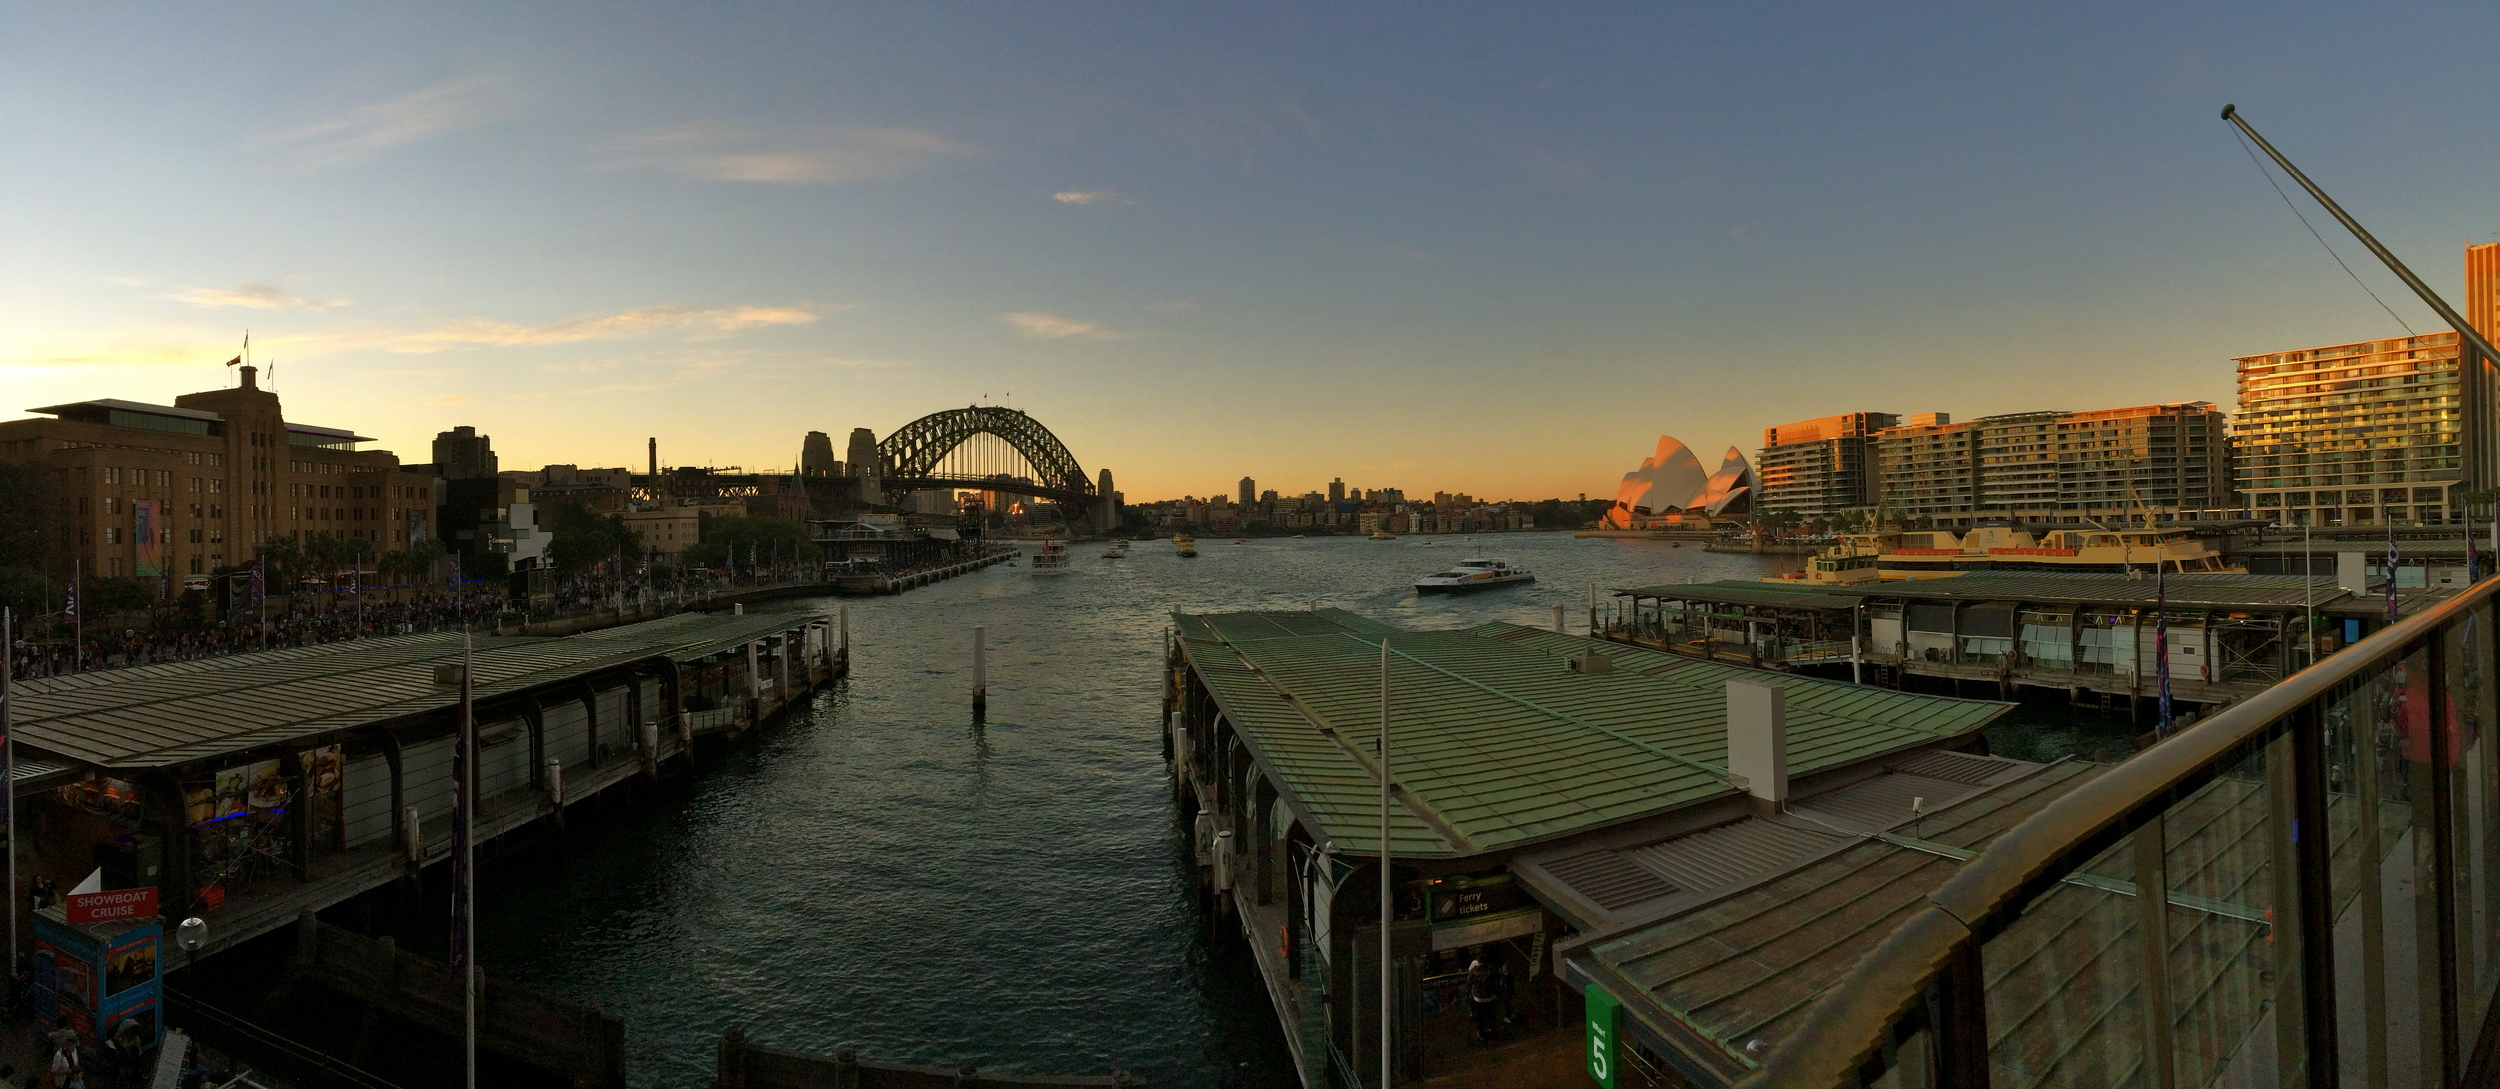 ◆ Sydney Harbour at dusk